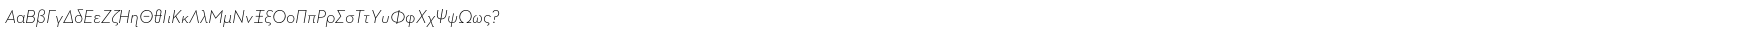 Neutra2TextGreek-LightItalic.otf